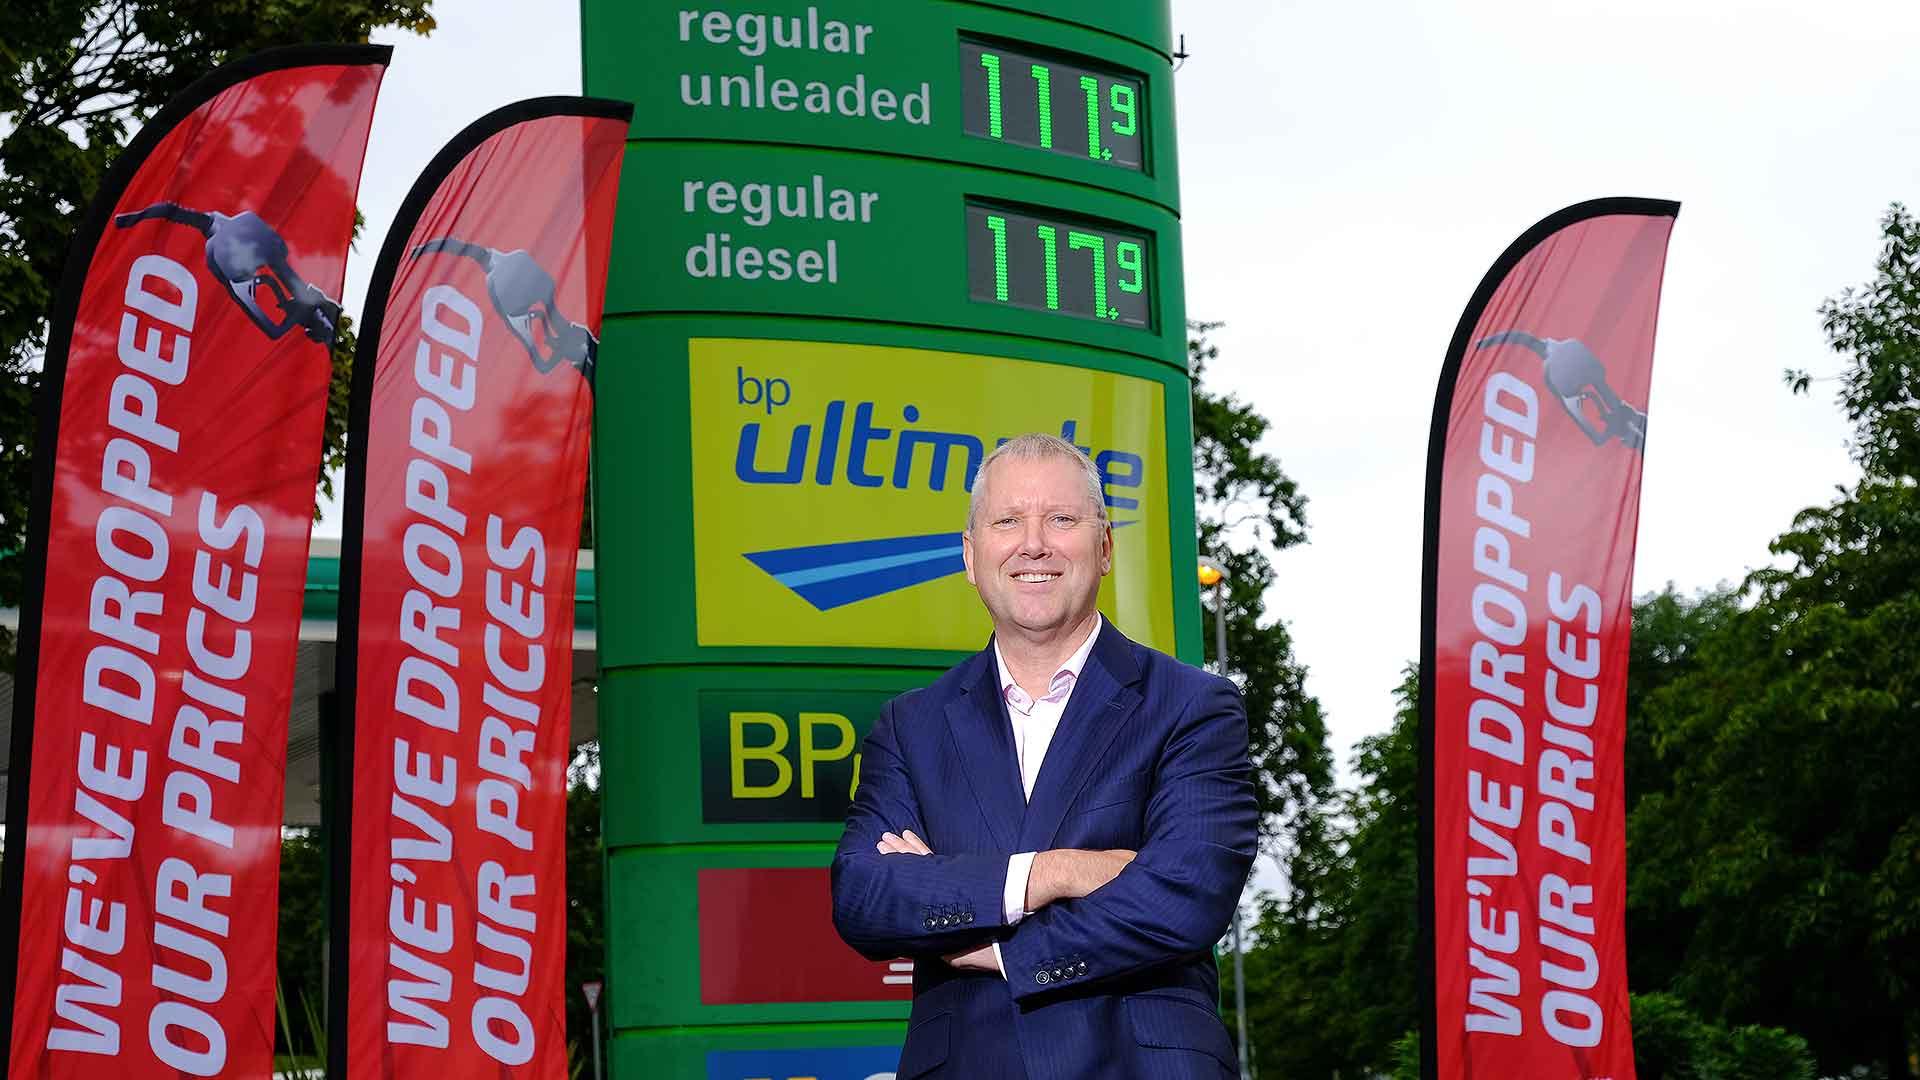 Moto trials fuel price cut at motorway service areas